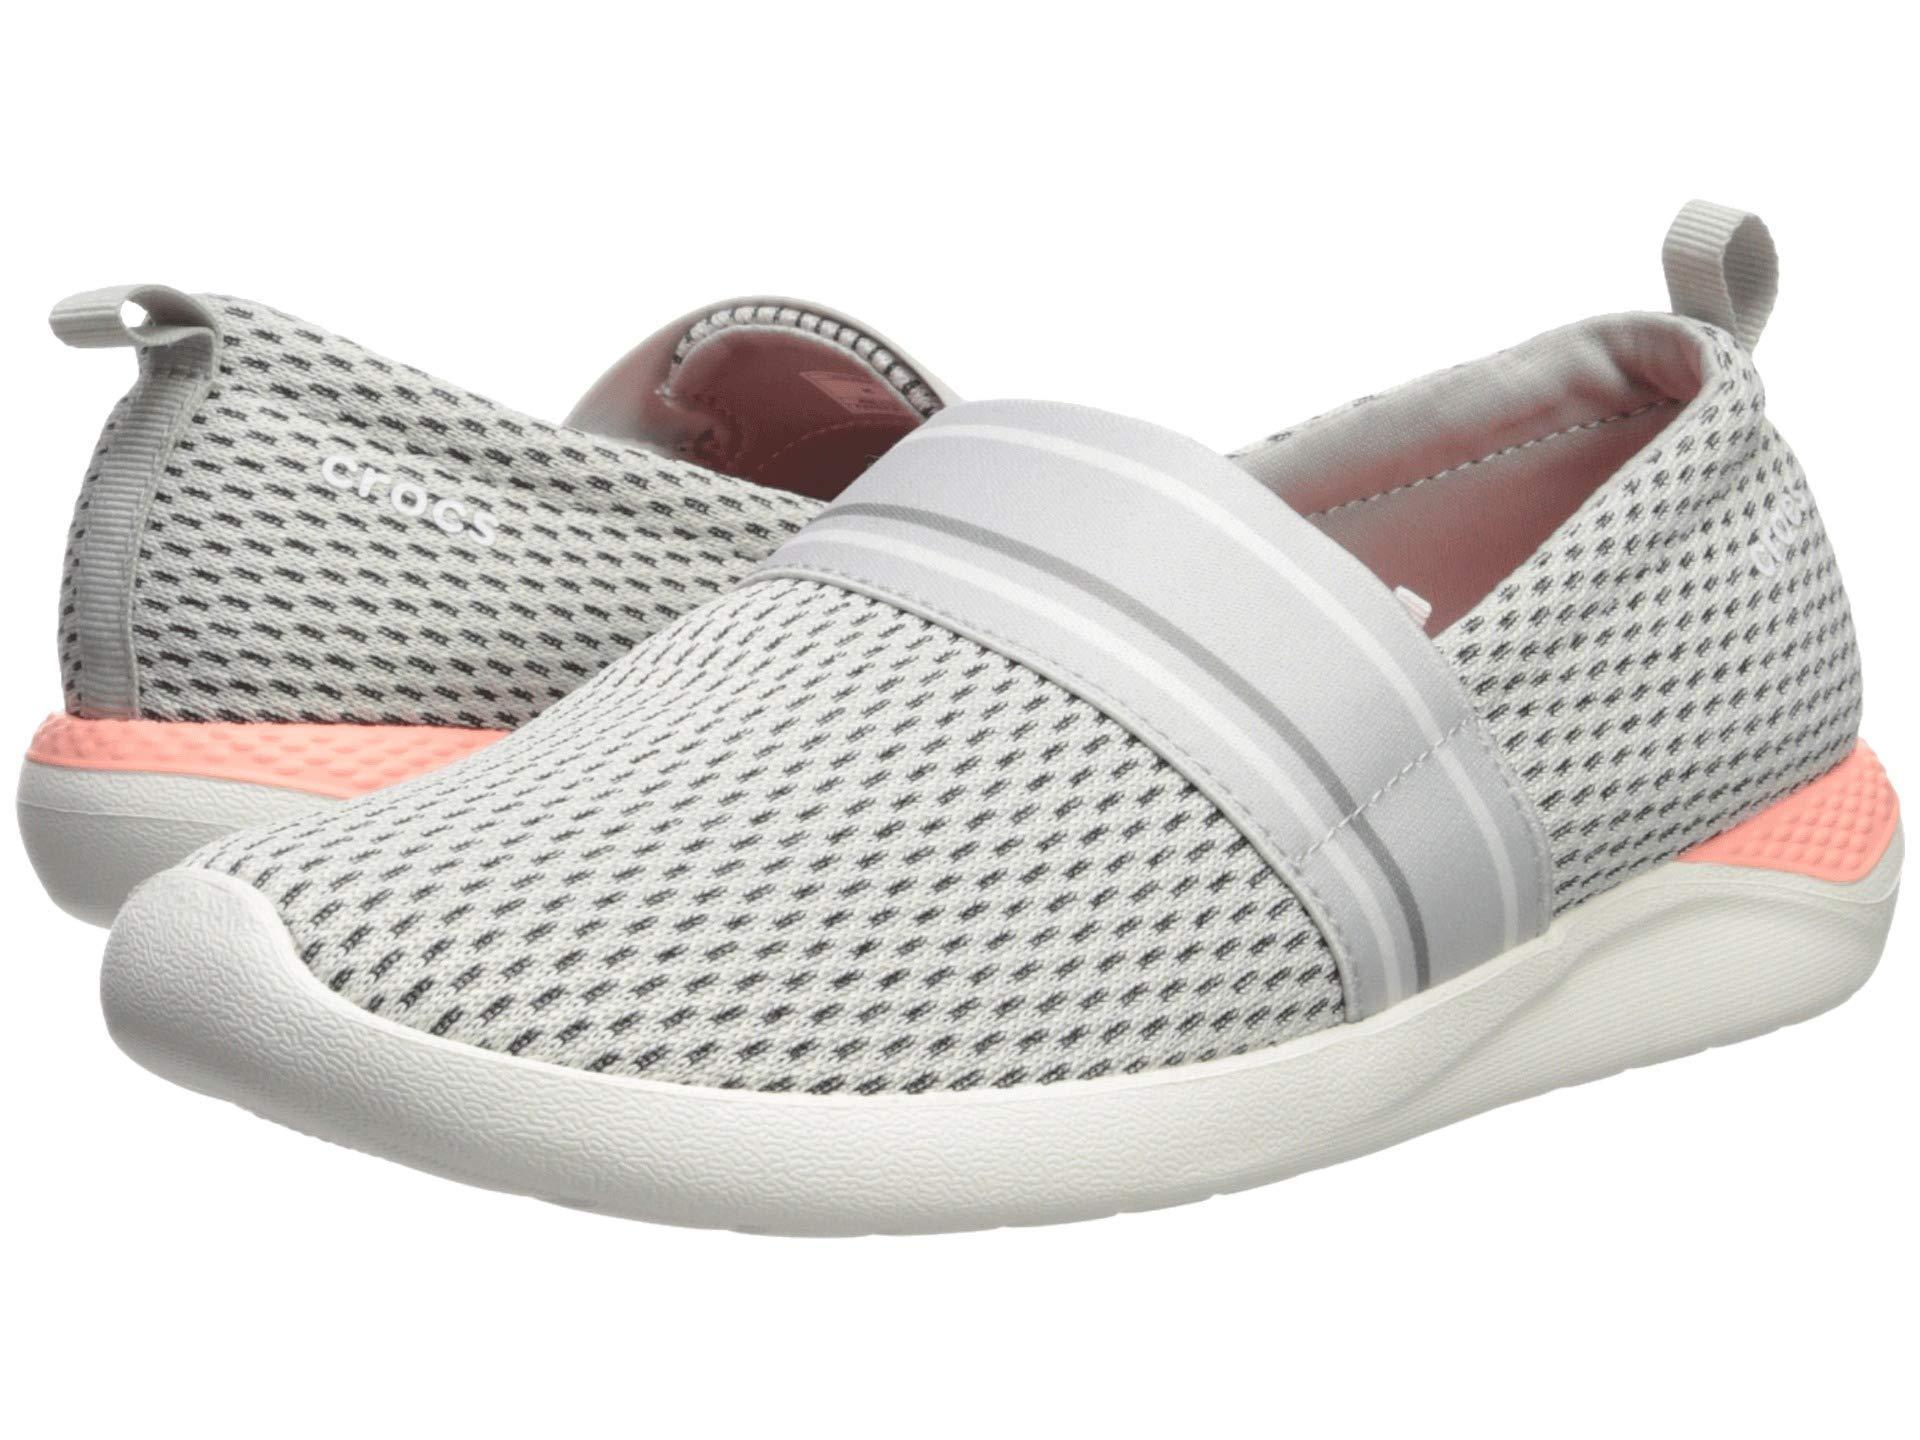 5161b08509 Lyst - Crocs™ Literide Mesh Slip-on Sneaker in White